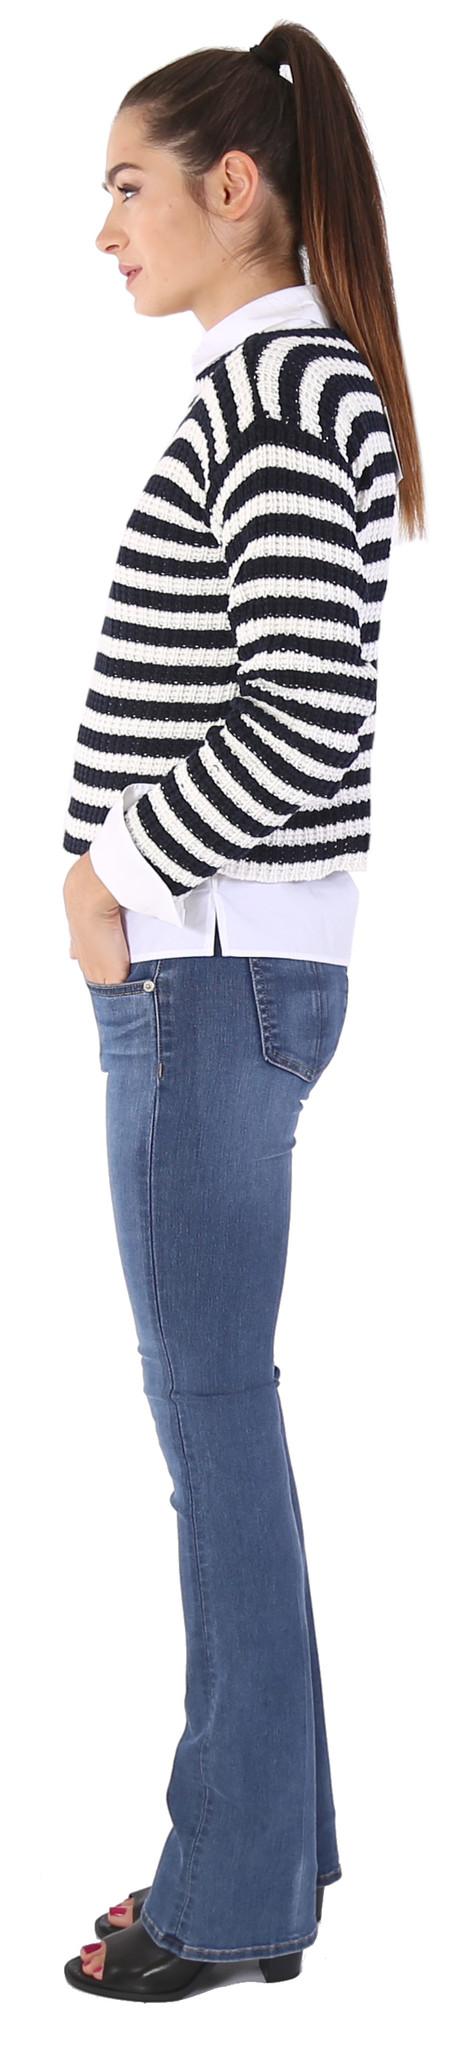 LILYA Amethyst Knit Sweater